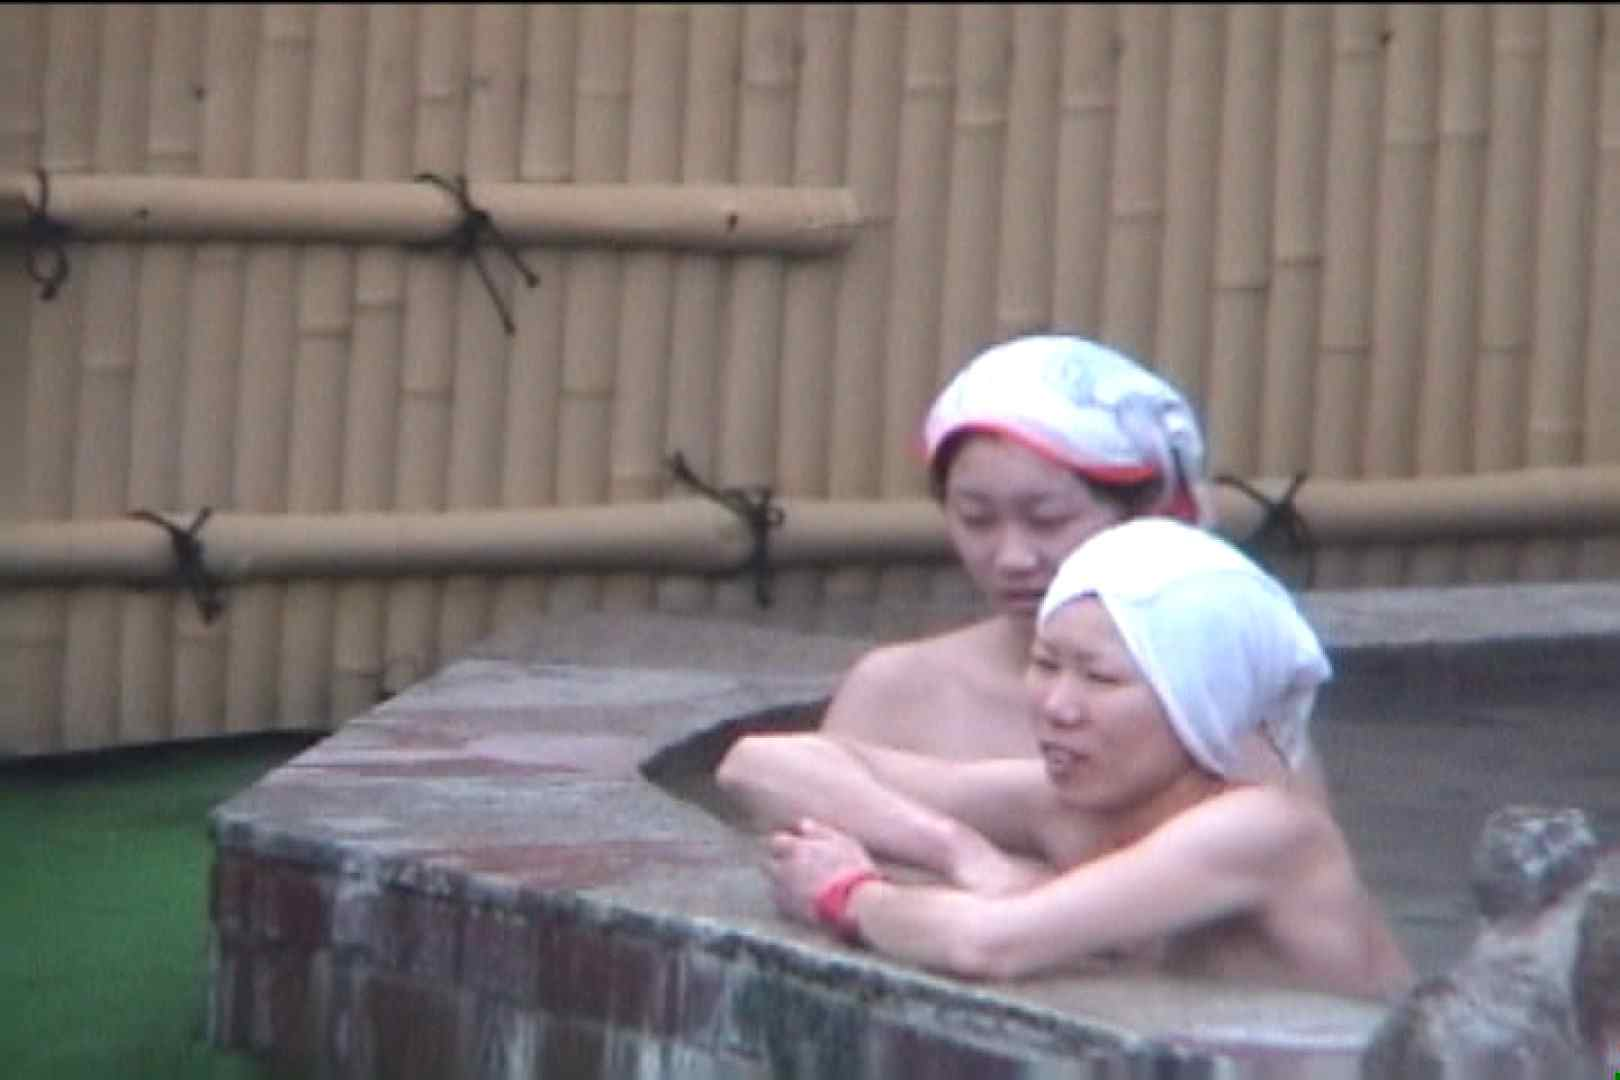 Aquaな露天風呂Vol.91【VIP限定】 盗撮シリーズ | 露天風呂編  99PIX 3